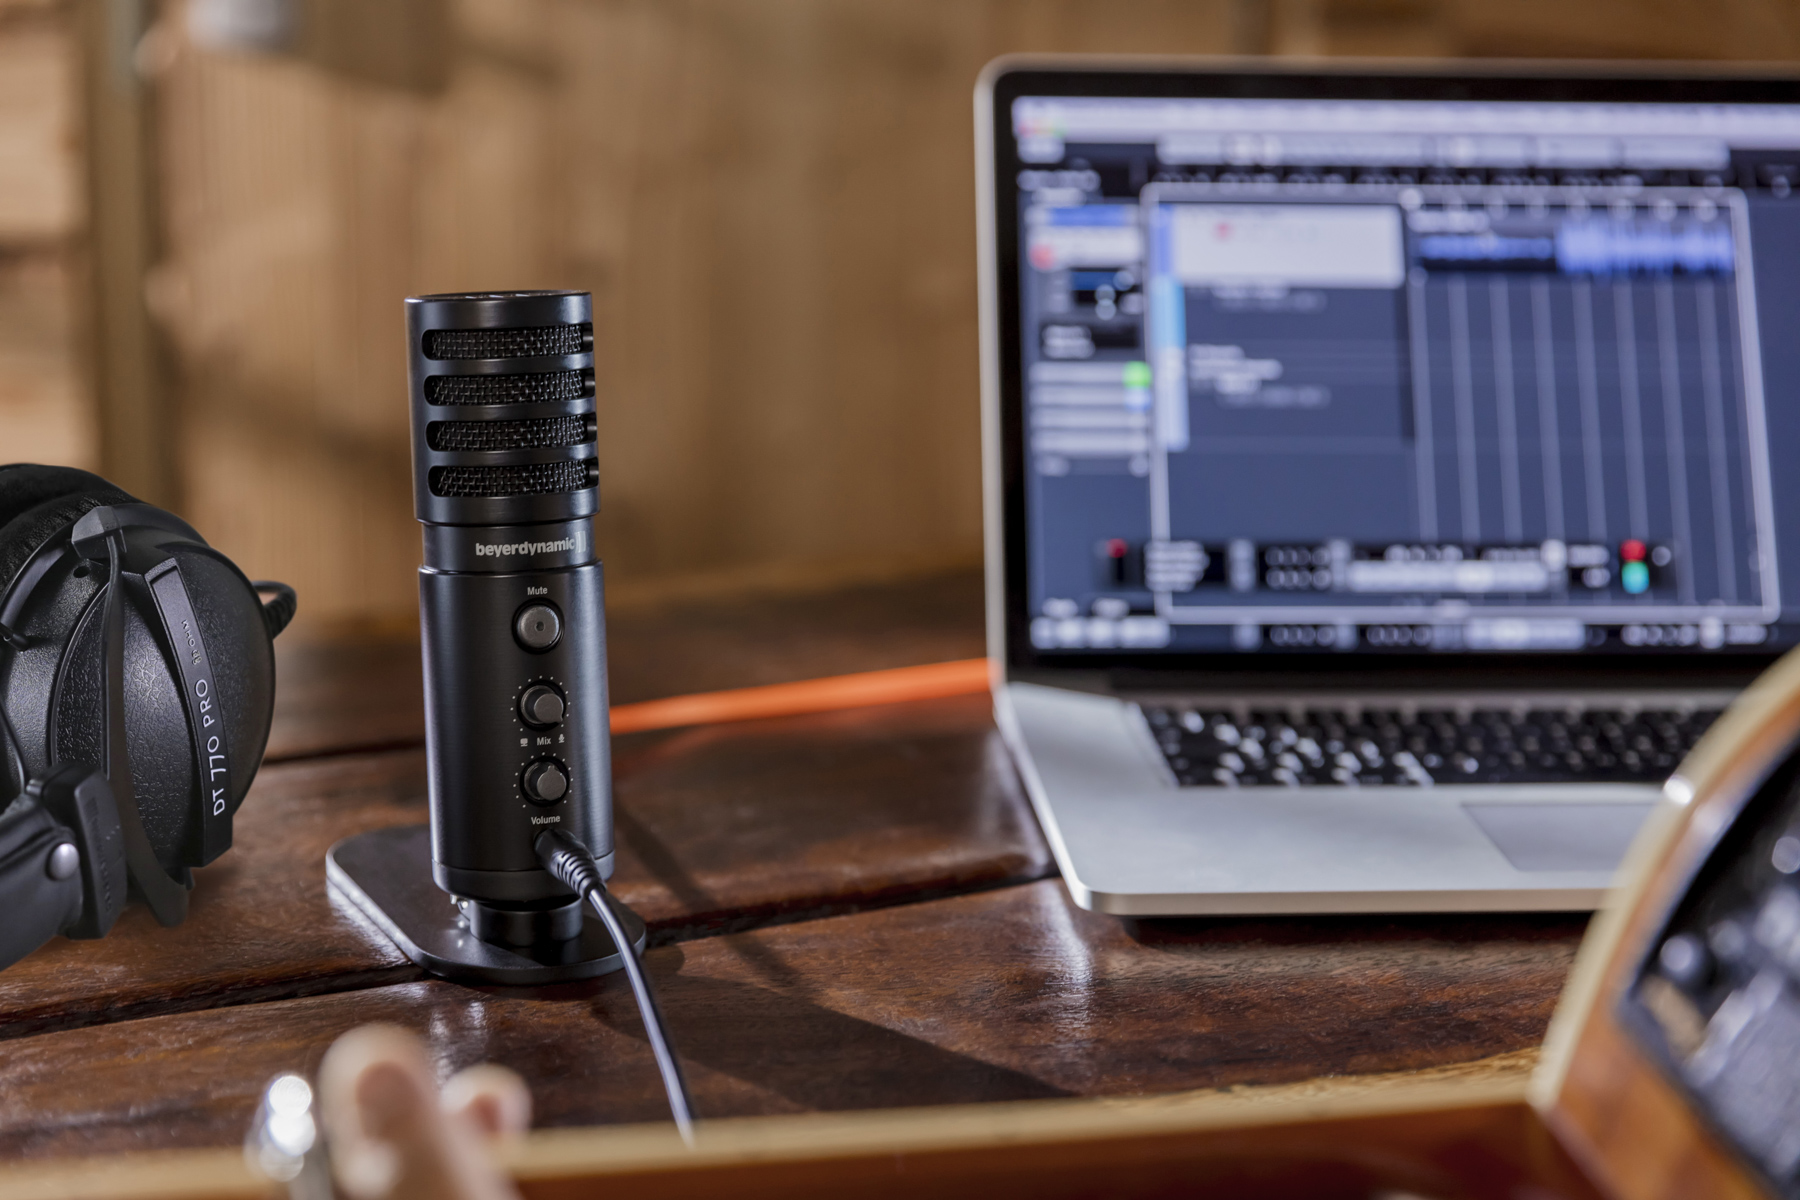 News: Beyerdynamic Creator Bundles mit dem Interface Fox, Kopfhörern und Cubase 9 LE